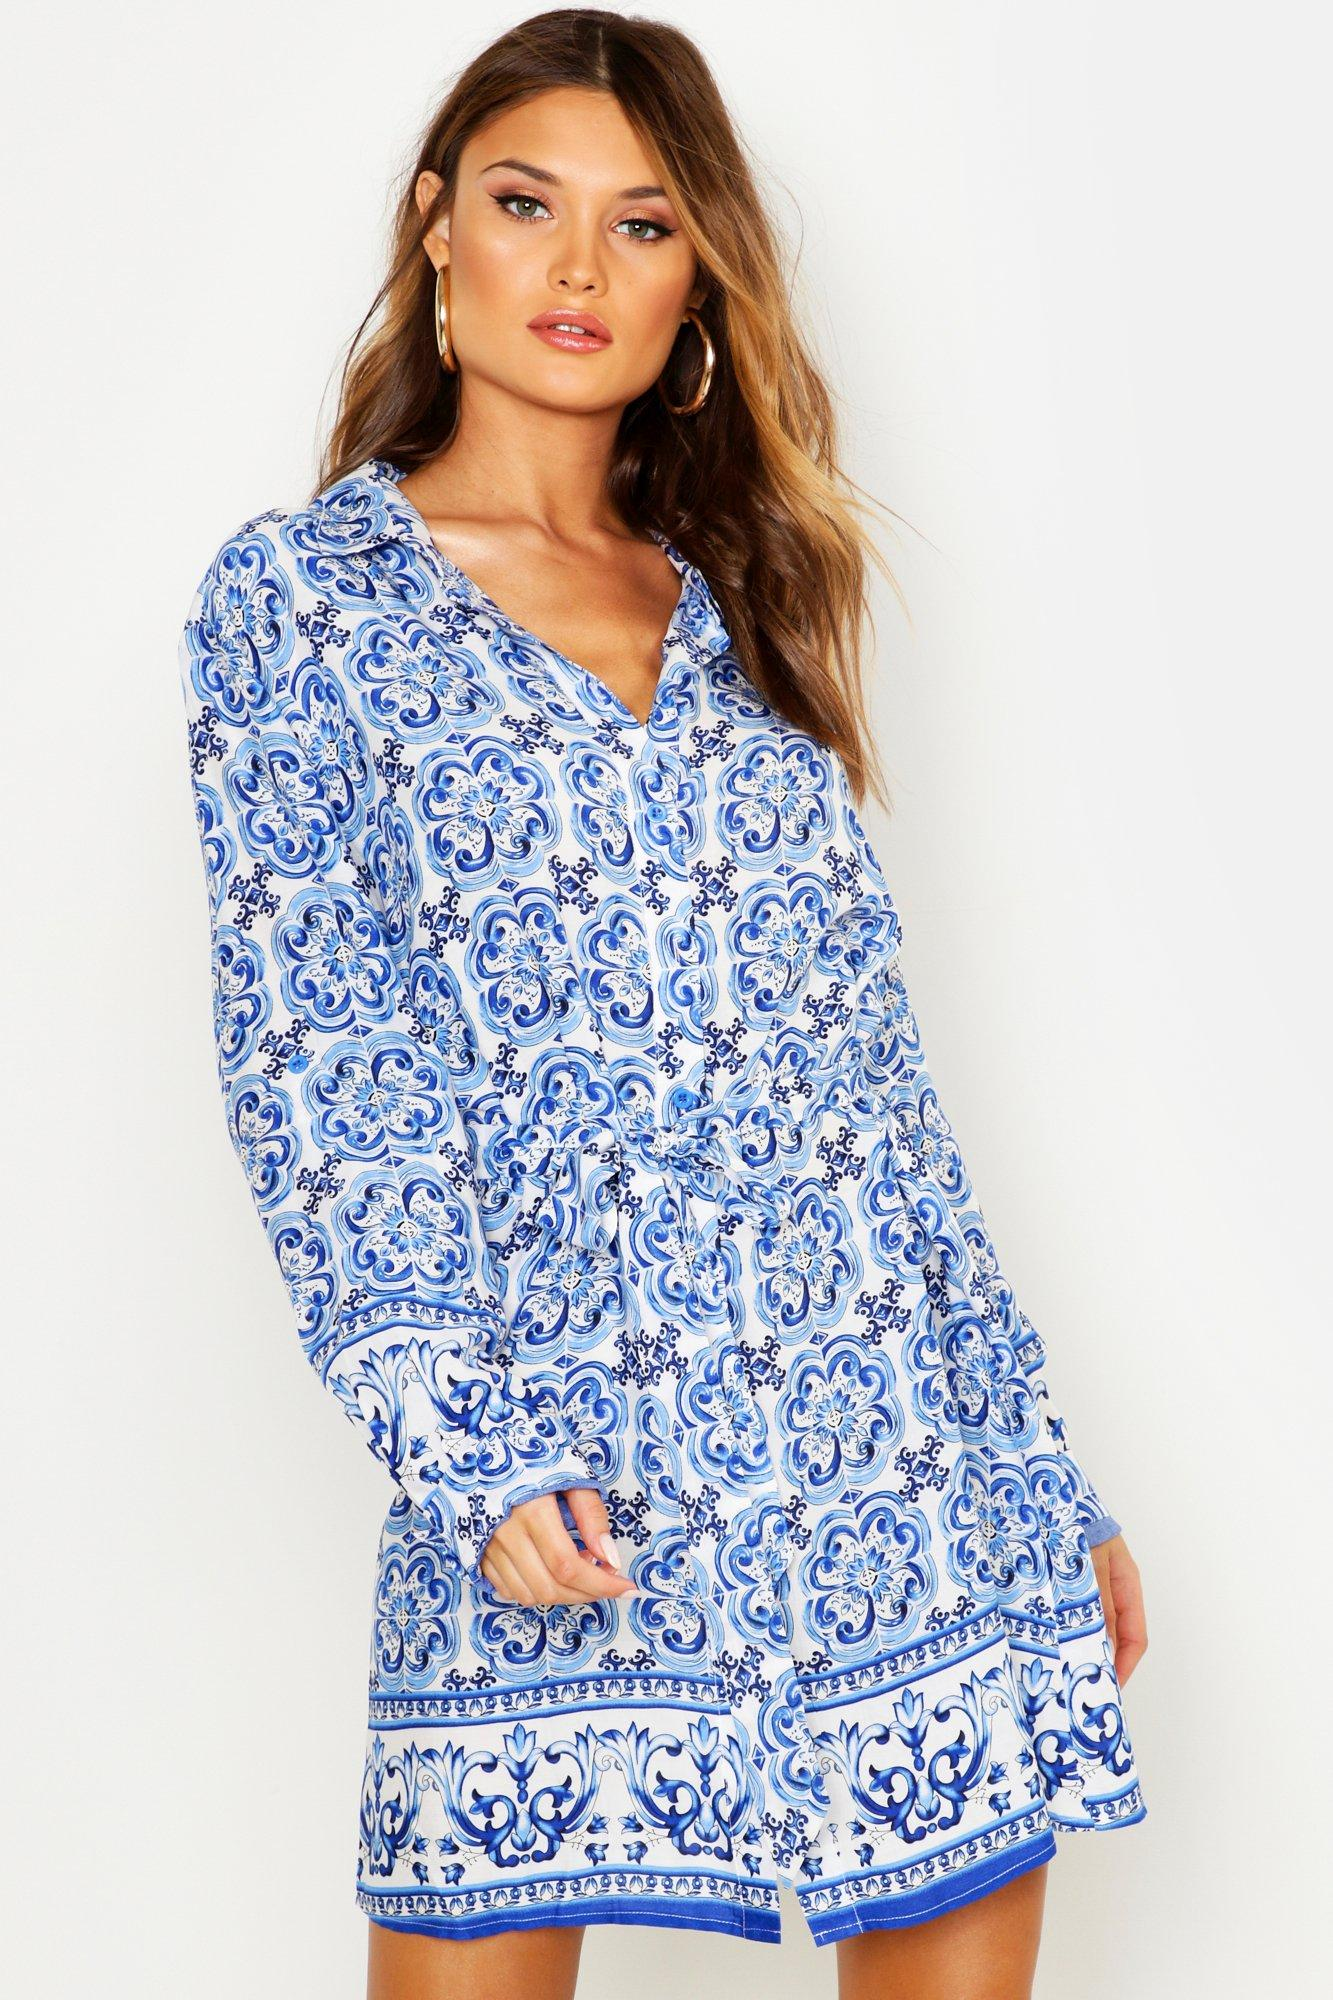 Womens Blusenkleid mit Kachel-Print - Blau - 36, Blau - Boohoo.com